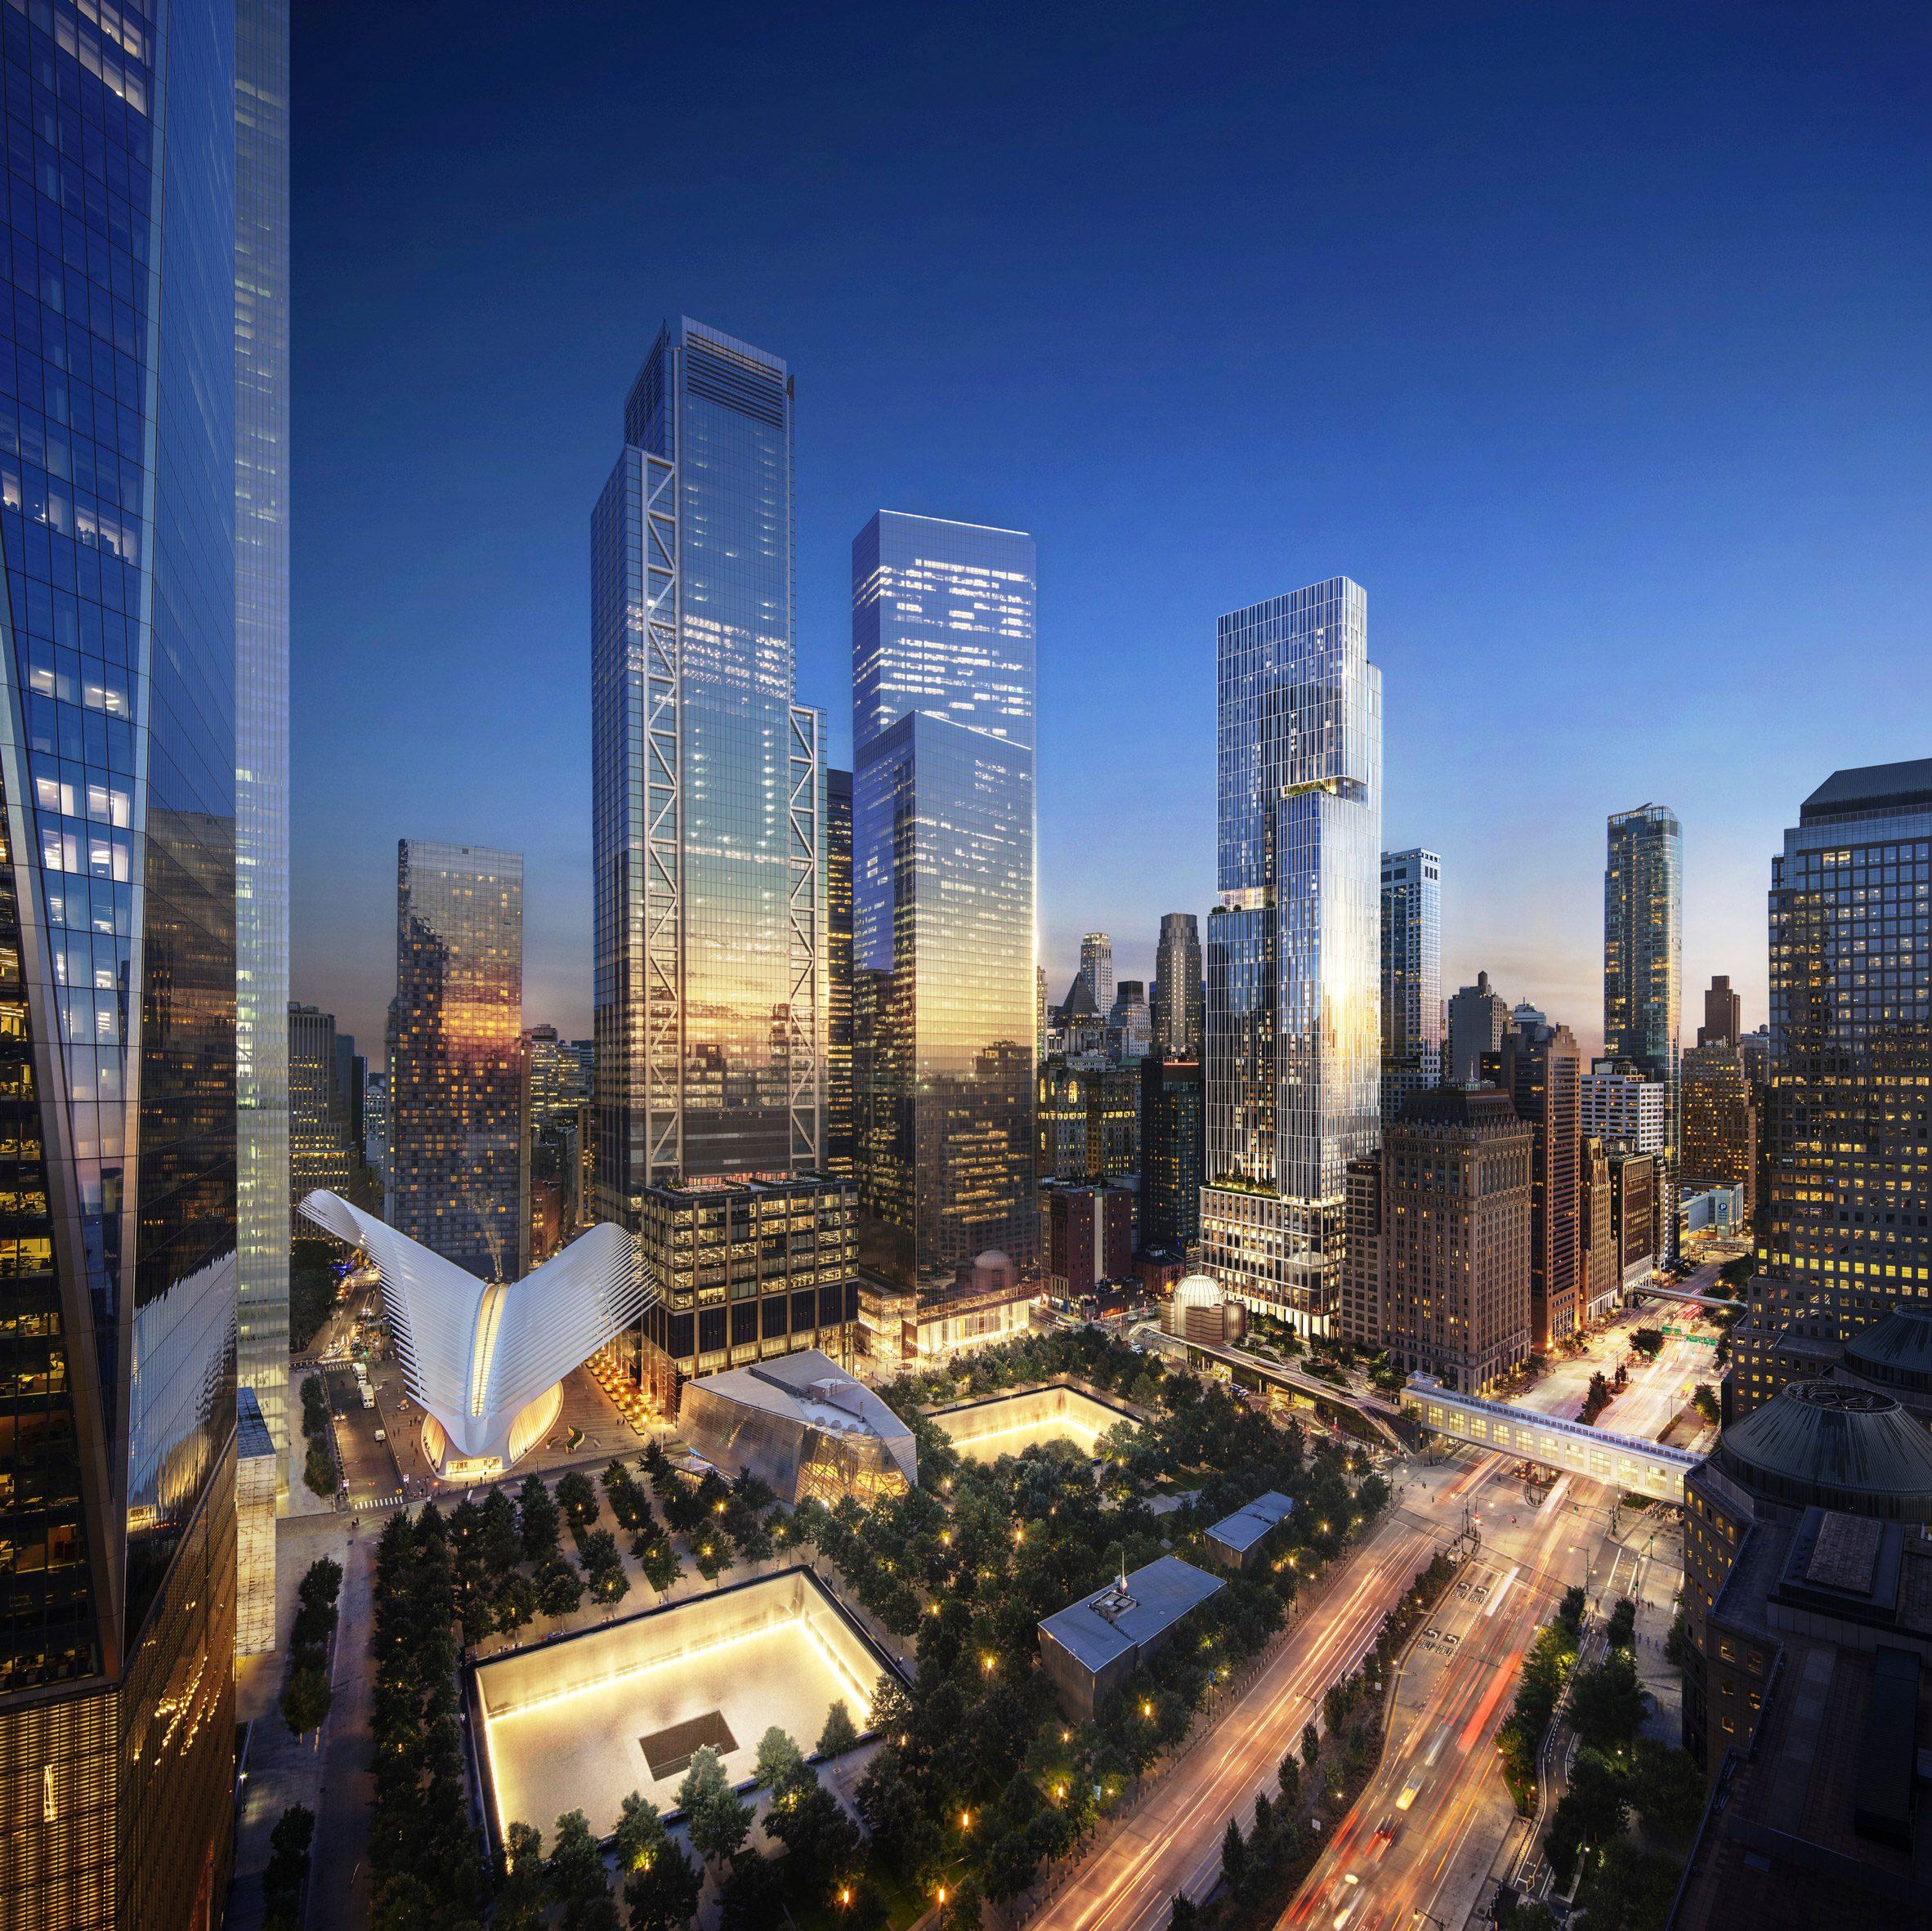 Visual of Ground Zero master plan and 5 World Trade Center